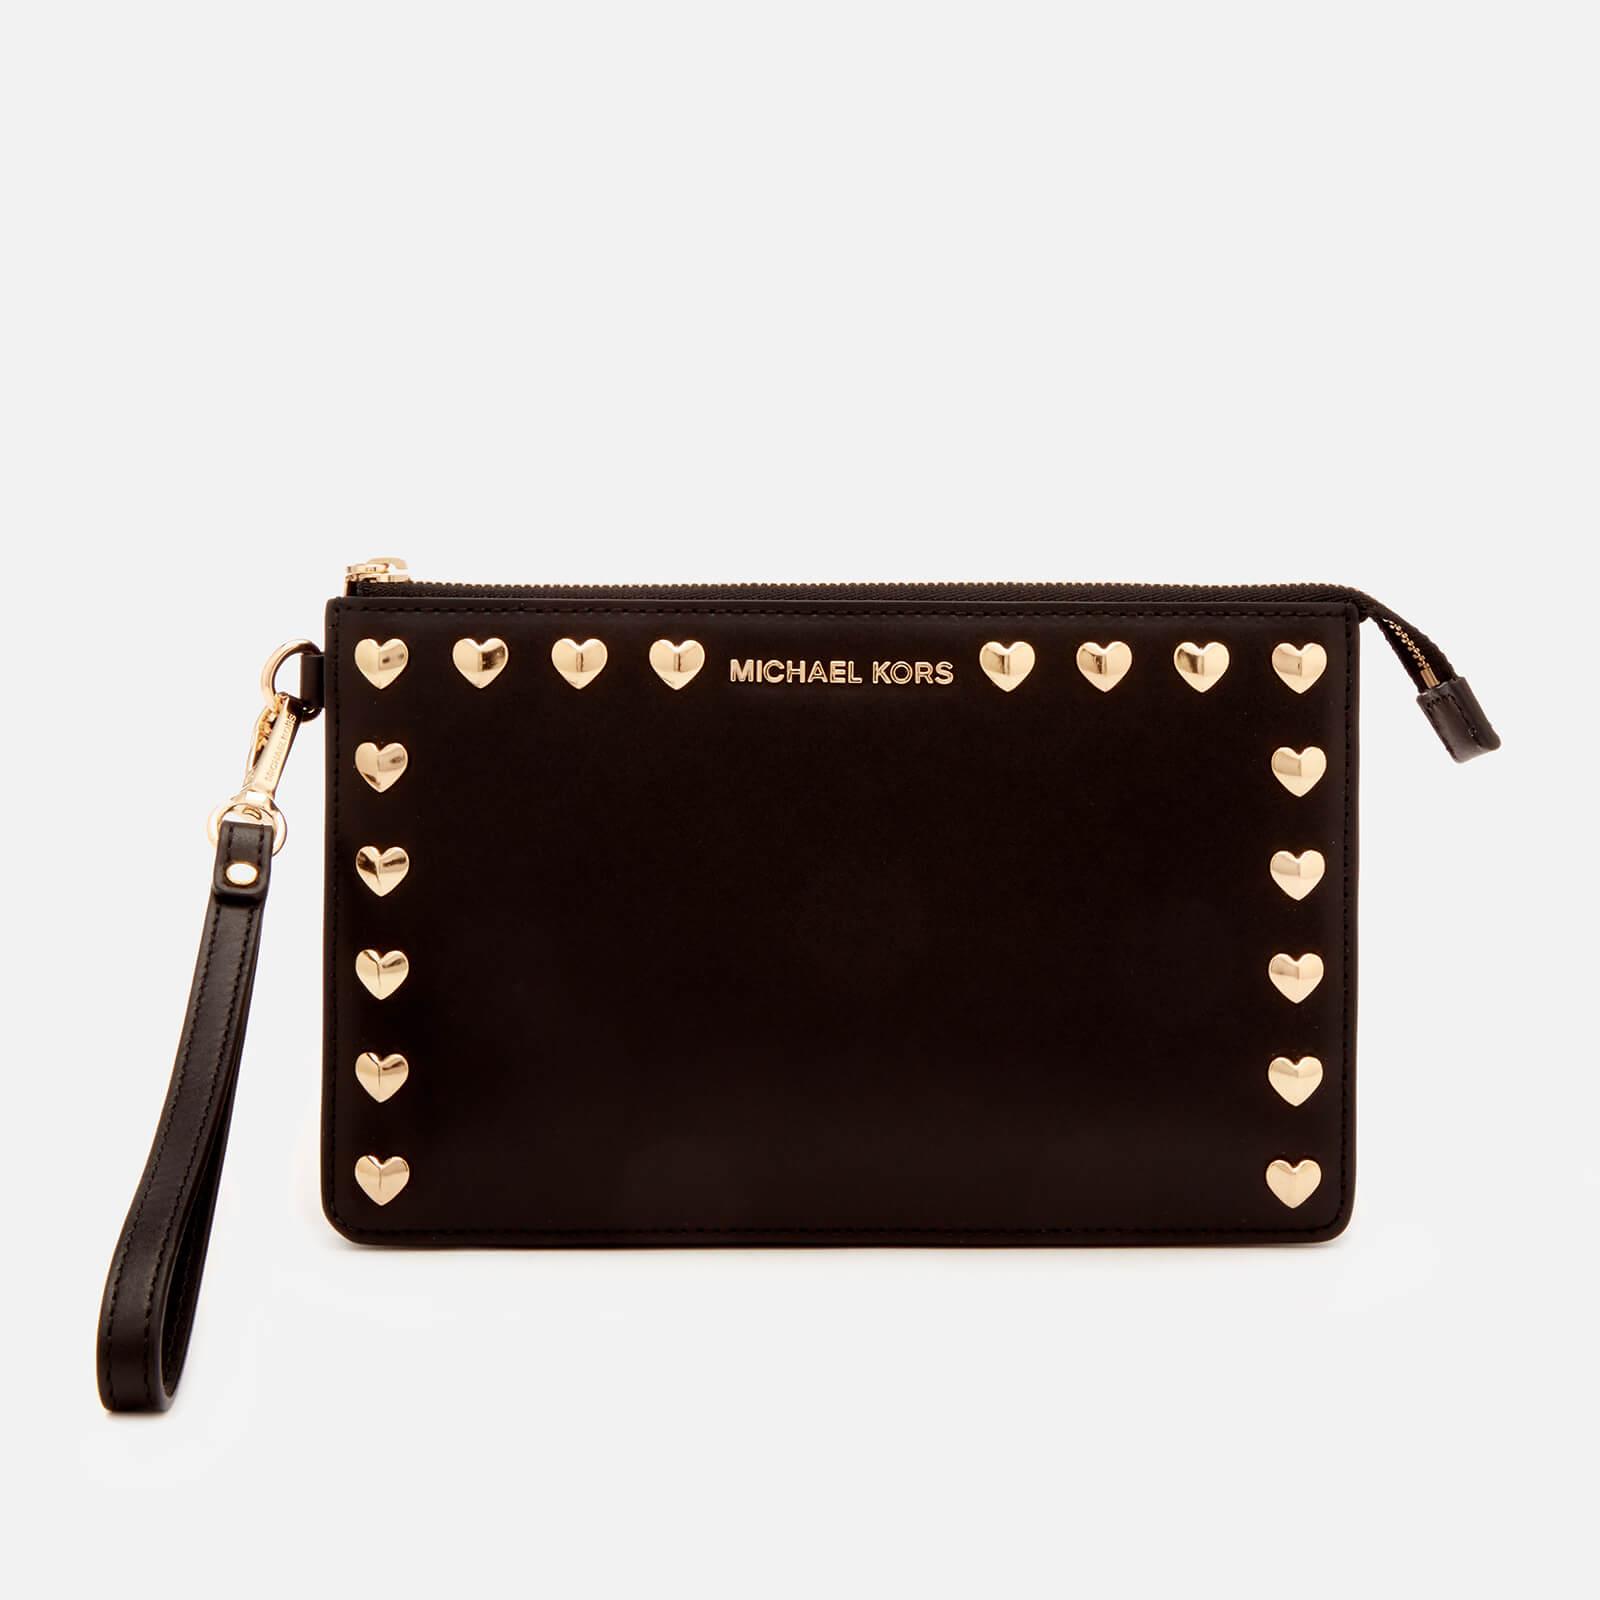 31208736dd04 MICHAEL MICHAEL KORS Women's Medium Gusset Wristlet Bag - Black - Free UK  Delivery over £50